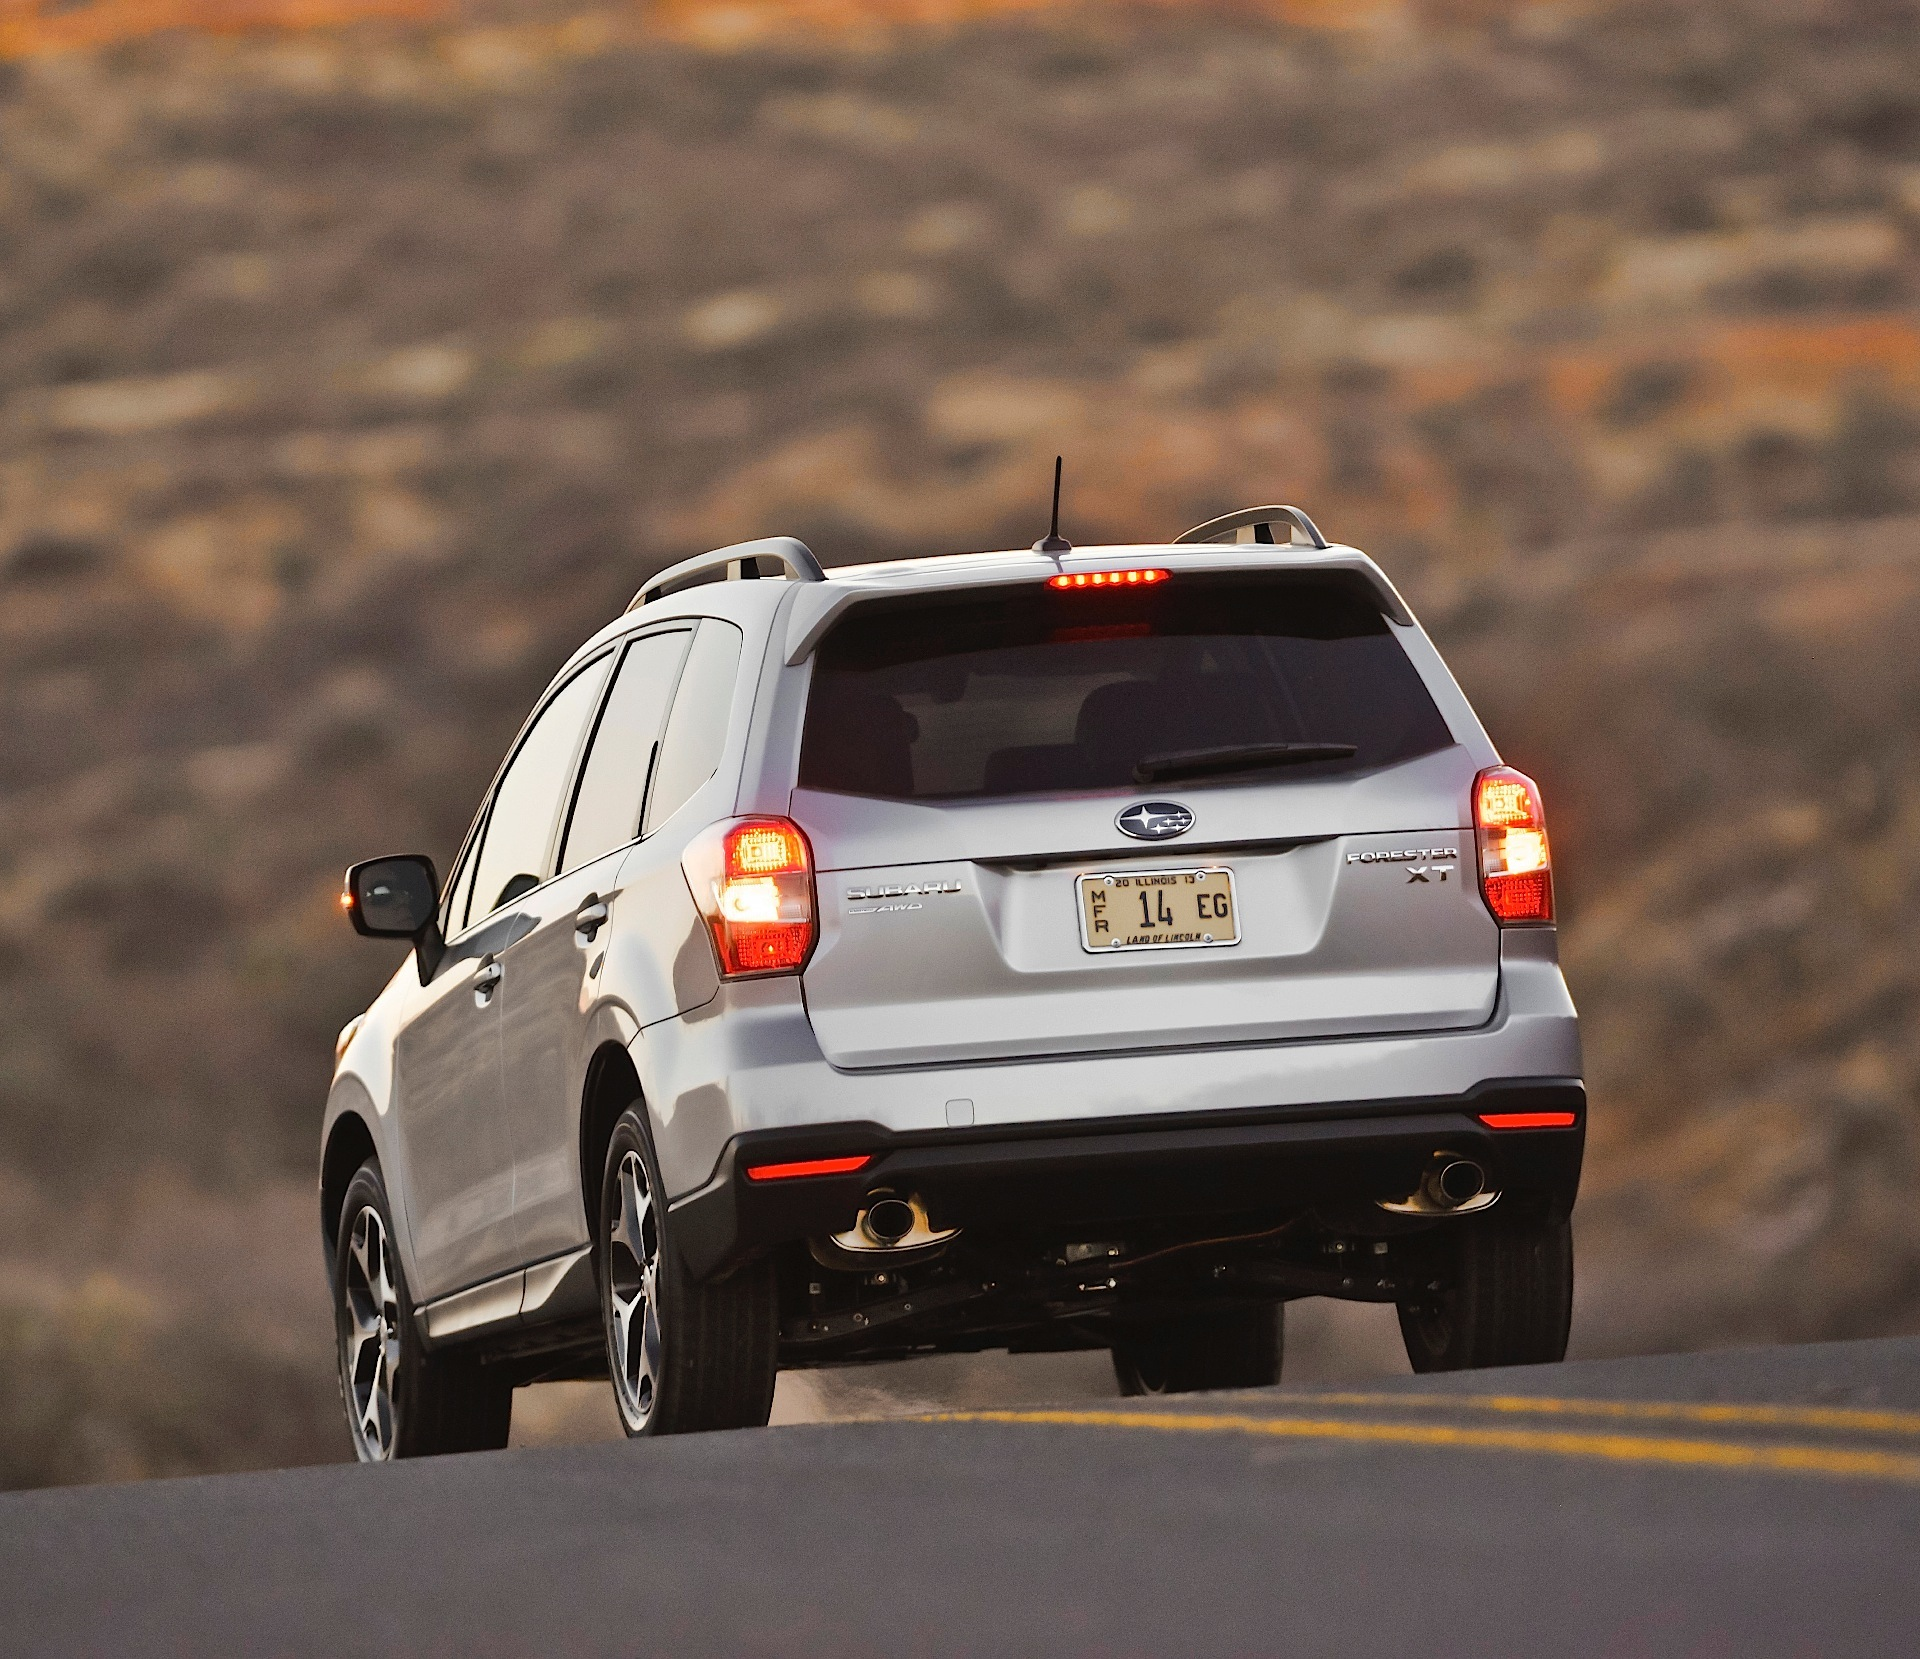 2015 Subaru Forester Transmission: 2013, 2014, 2015, 2016, 2017, 2018